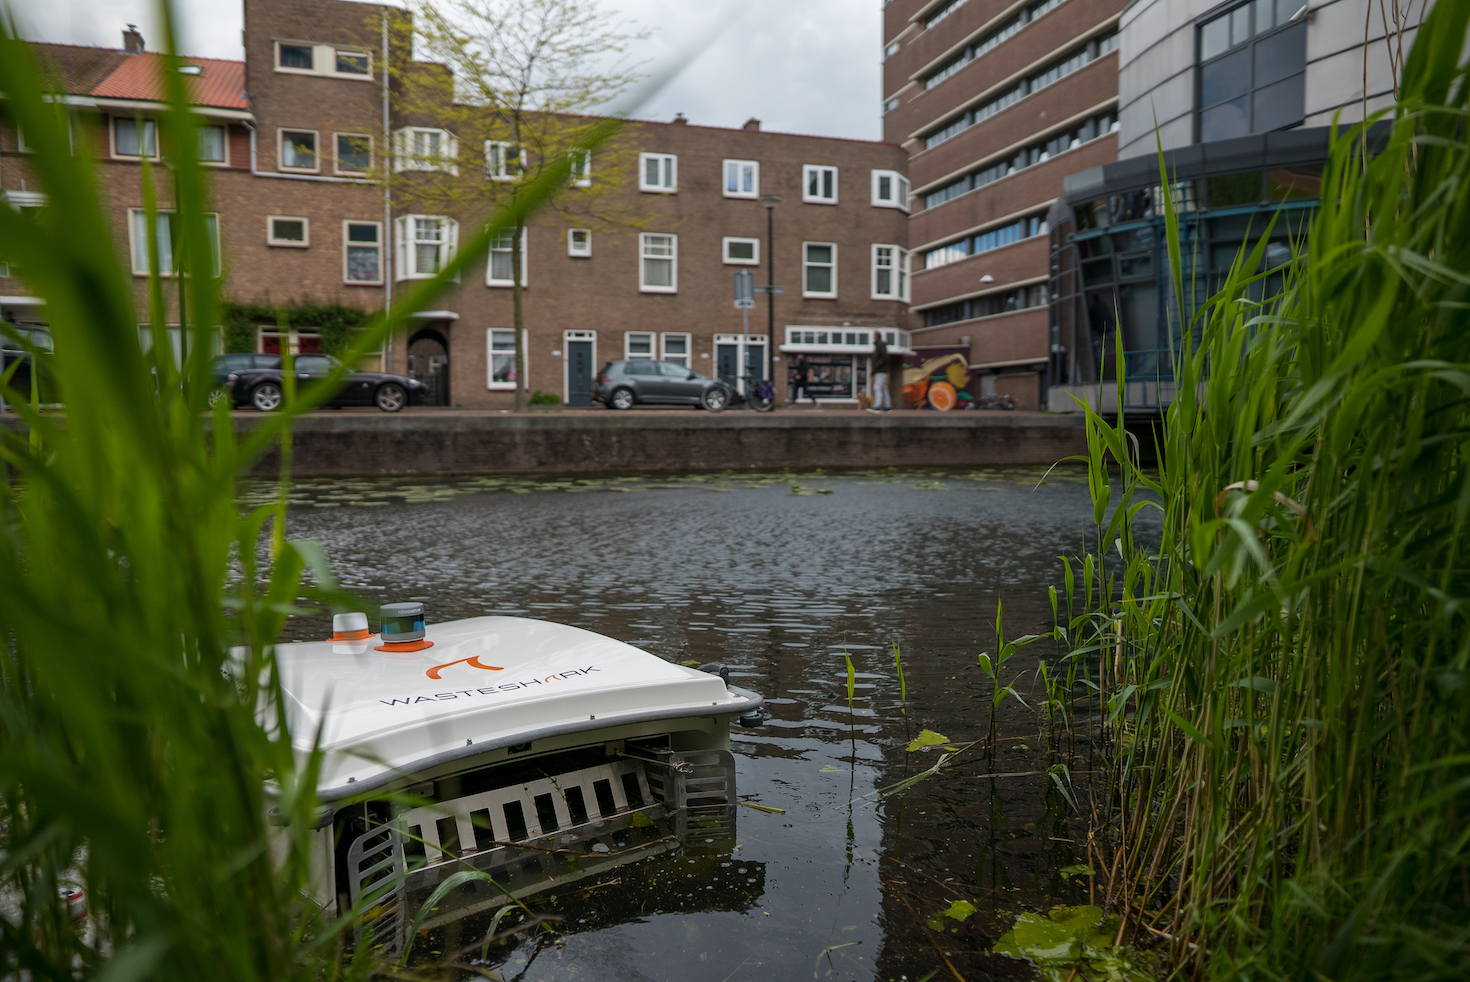 The WasteShark in a waterway in Dordrecht, the Netherlands.